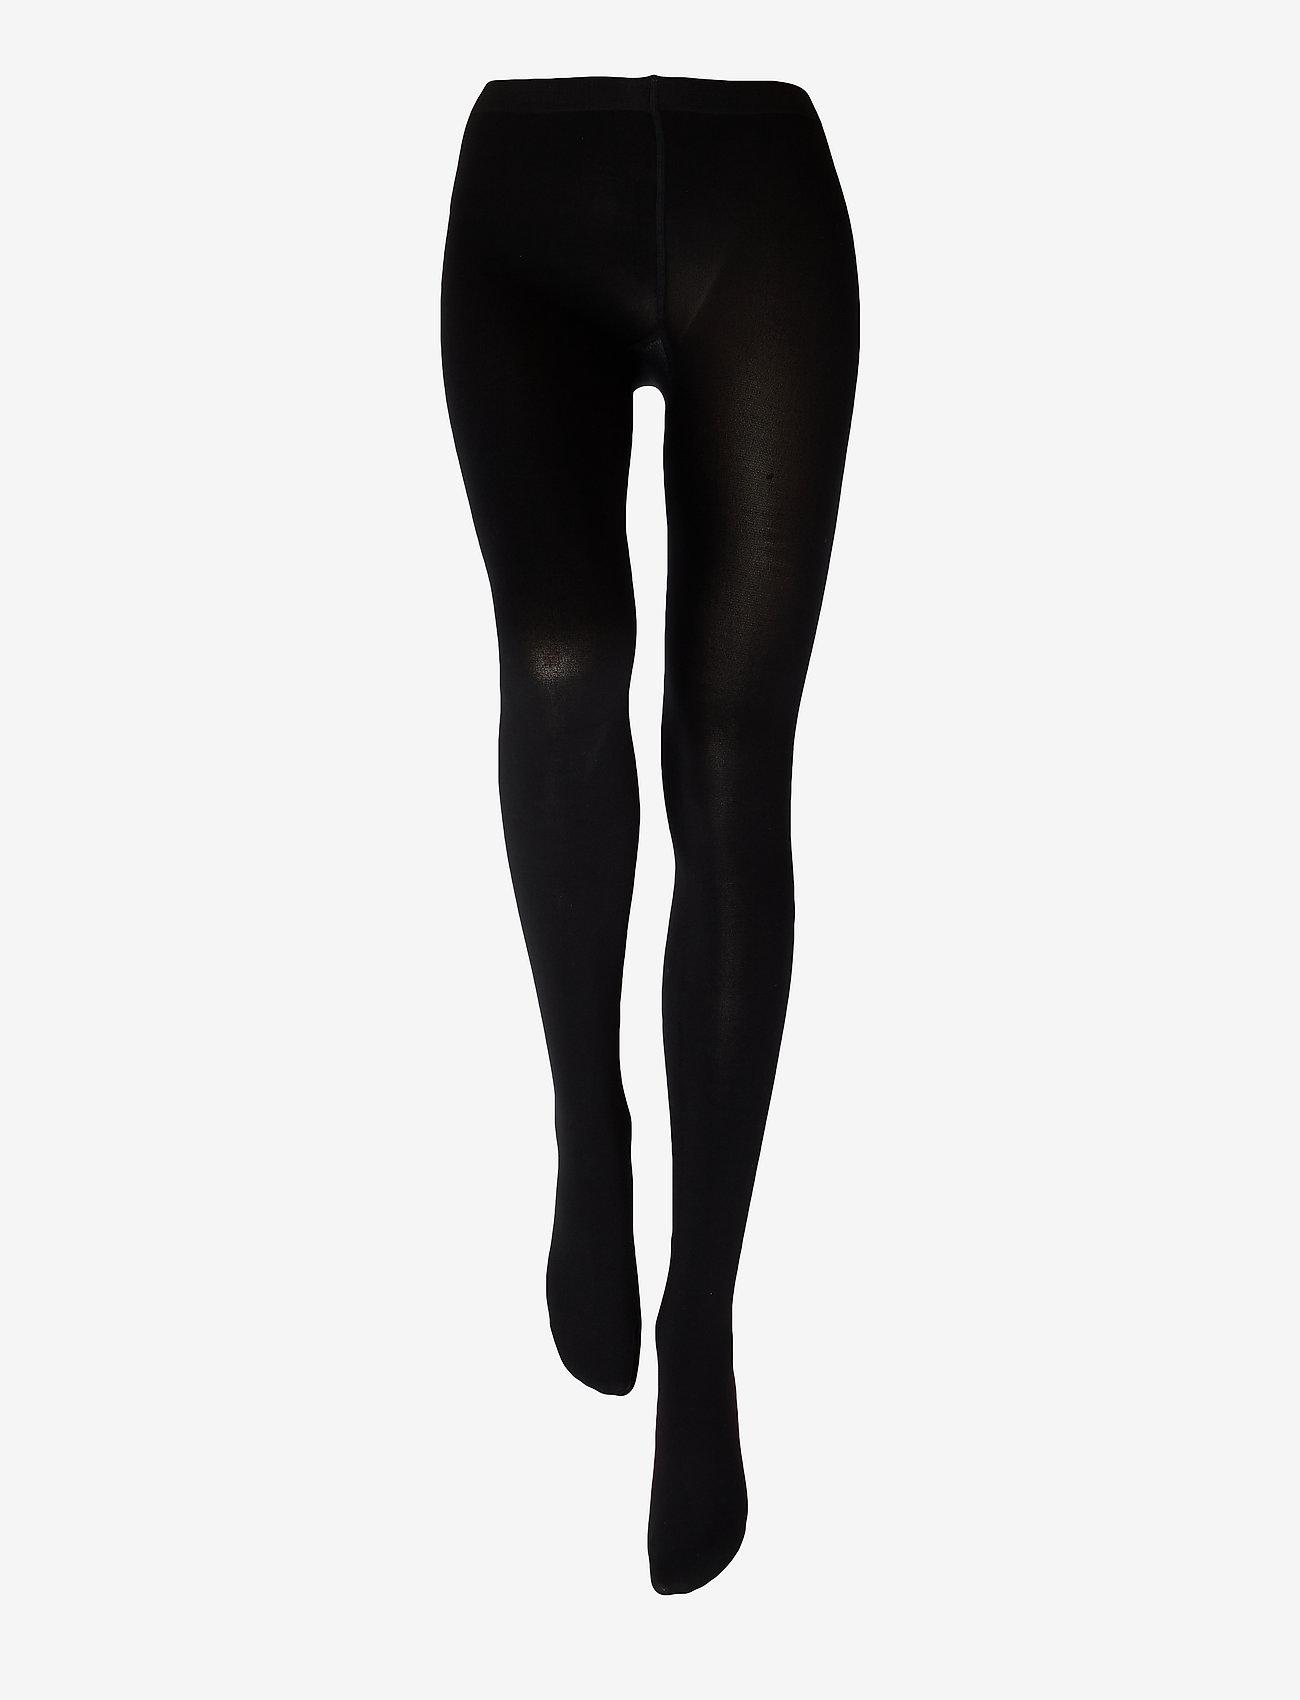 Falke Women - Warm Deluxe TI - pantyhose - black